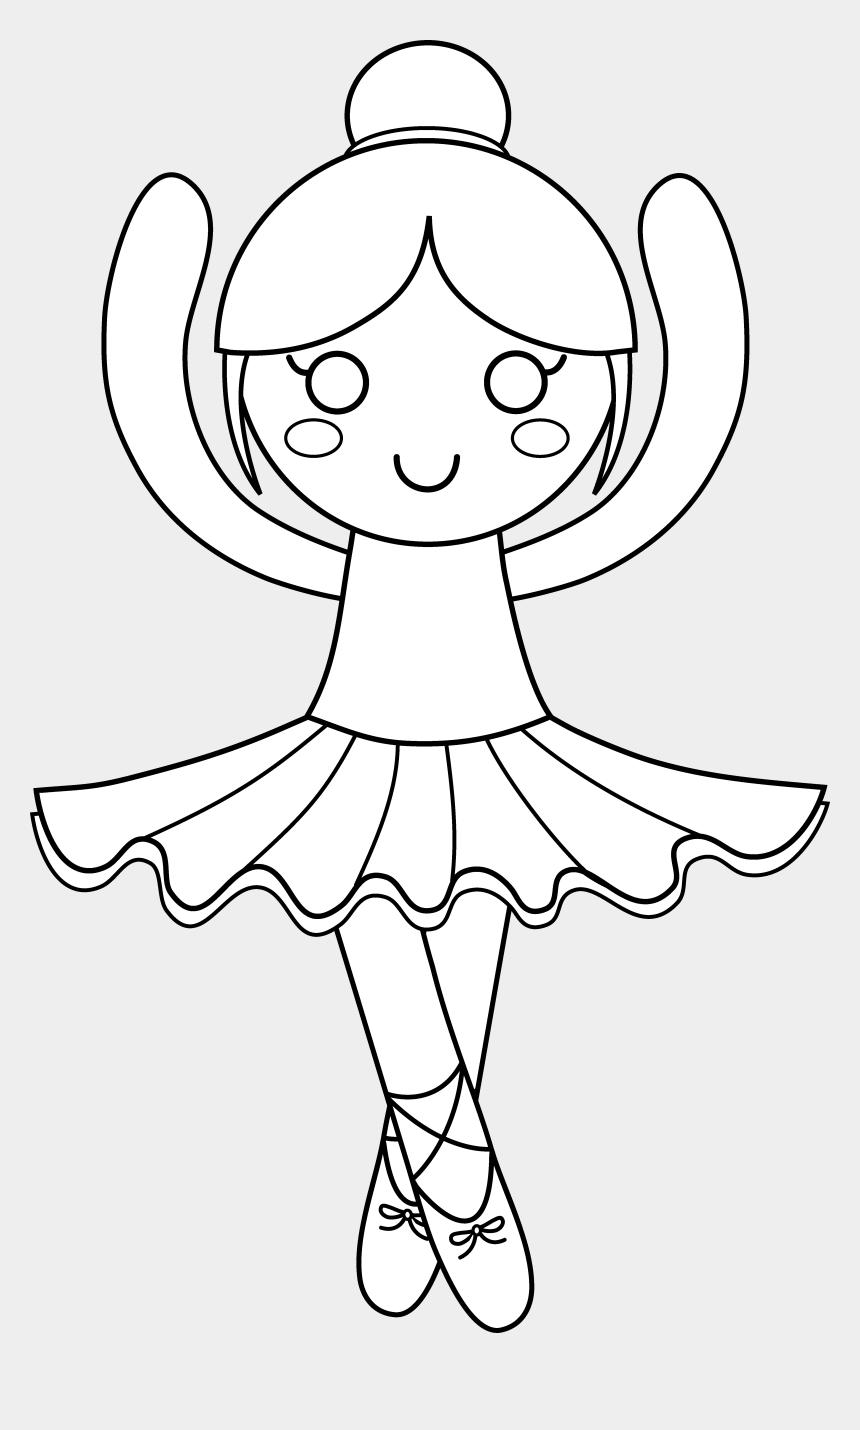 ballet shoes clip art, Cartoons - Ballet Clipart Outline - Cute Ballerina Coloring Pages